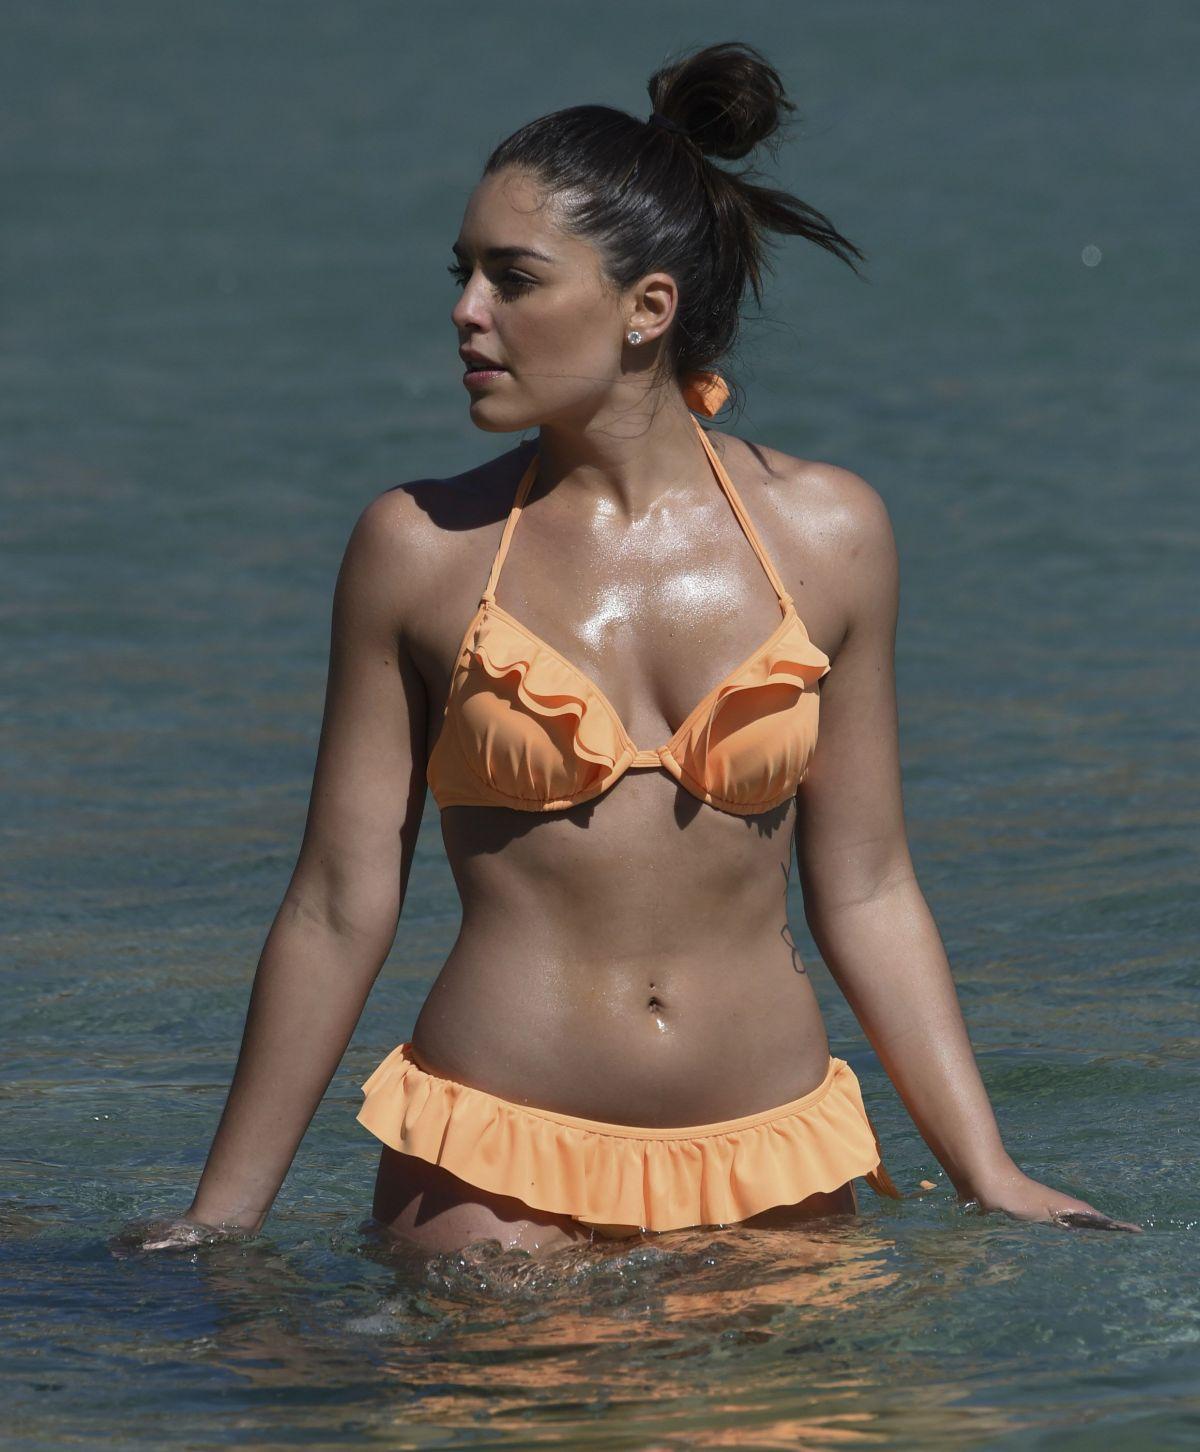 OLYMPIA VALANCE in Bikini at a Beach in Mykonos 10/03/2016